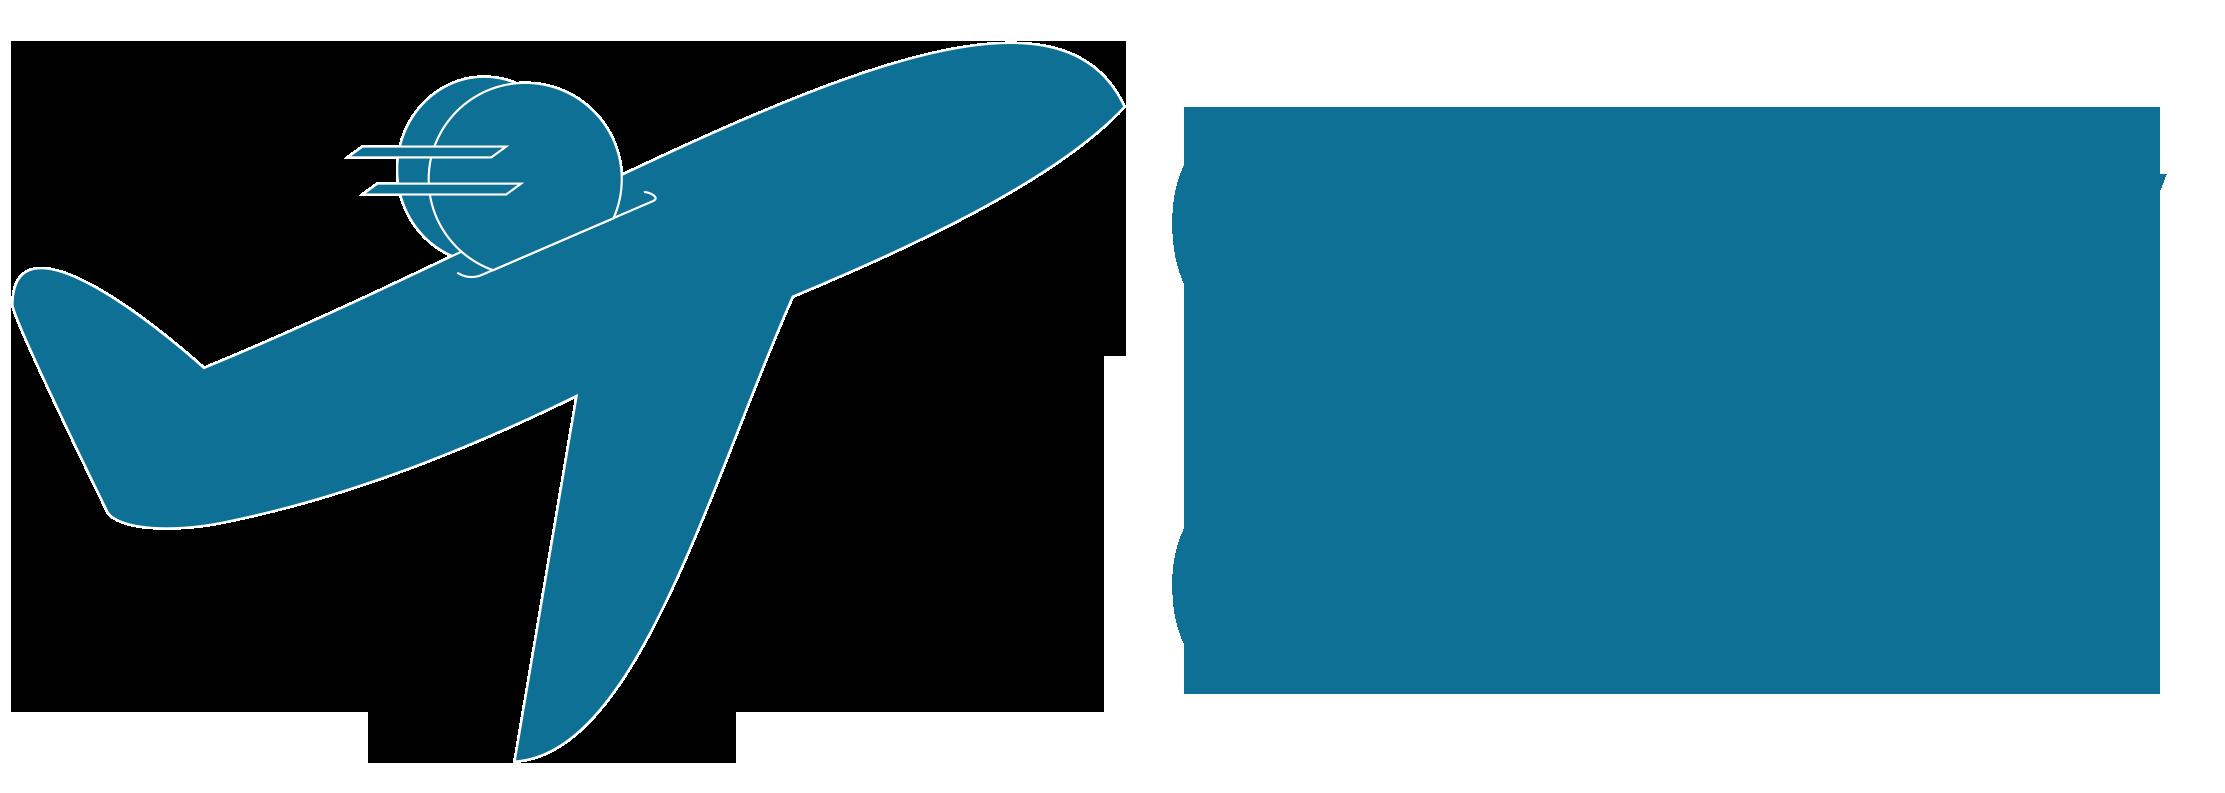 Qcheck_logo